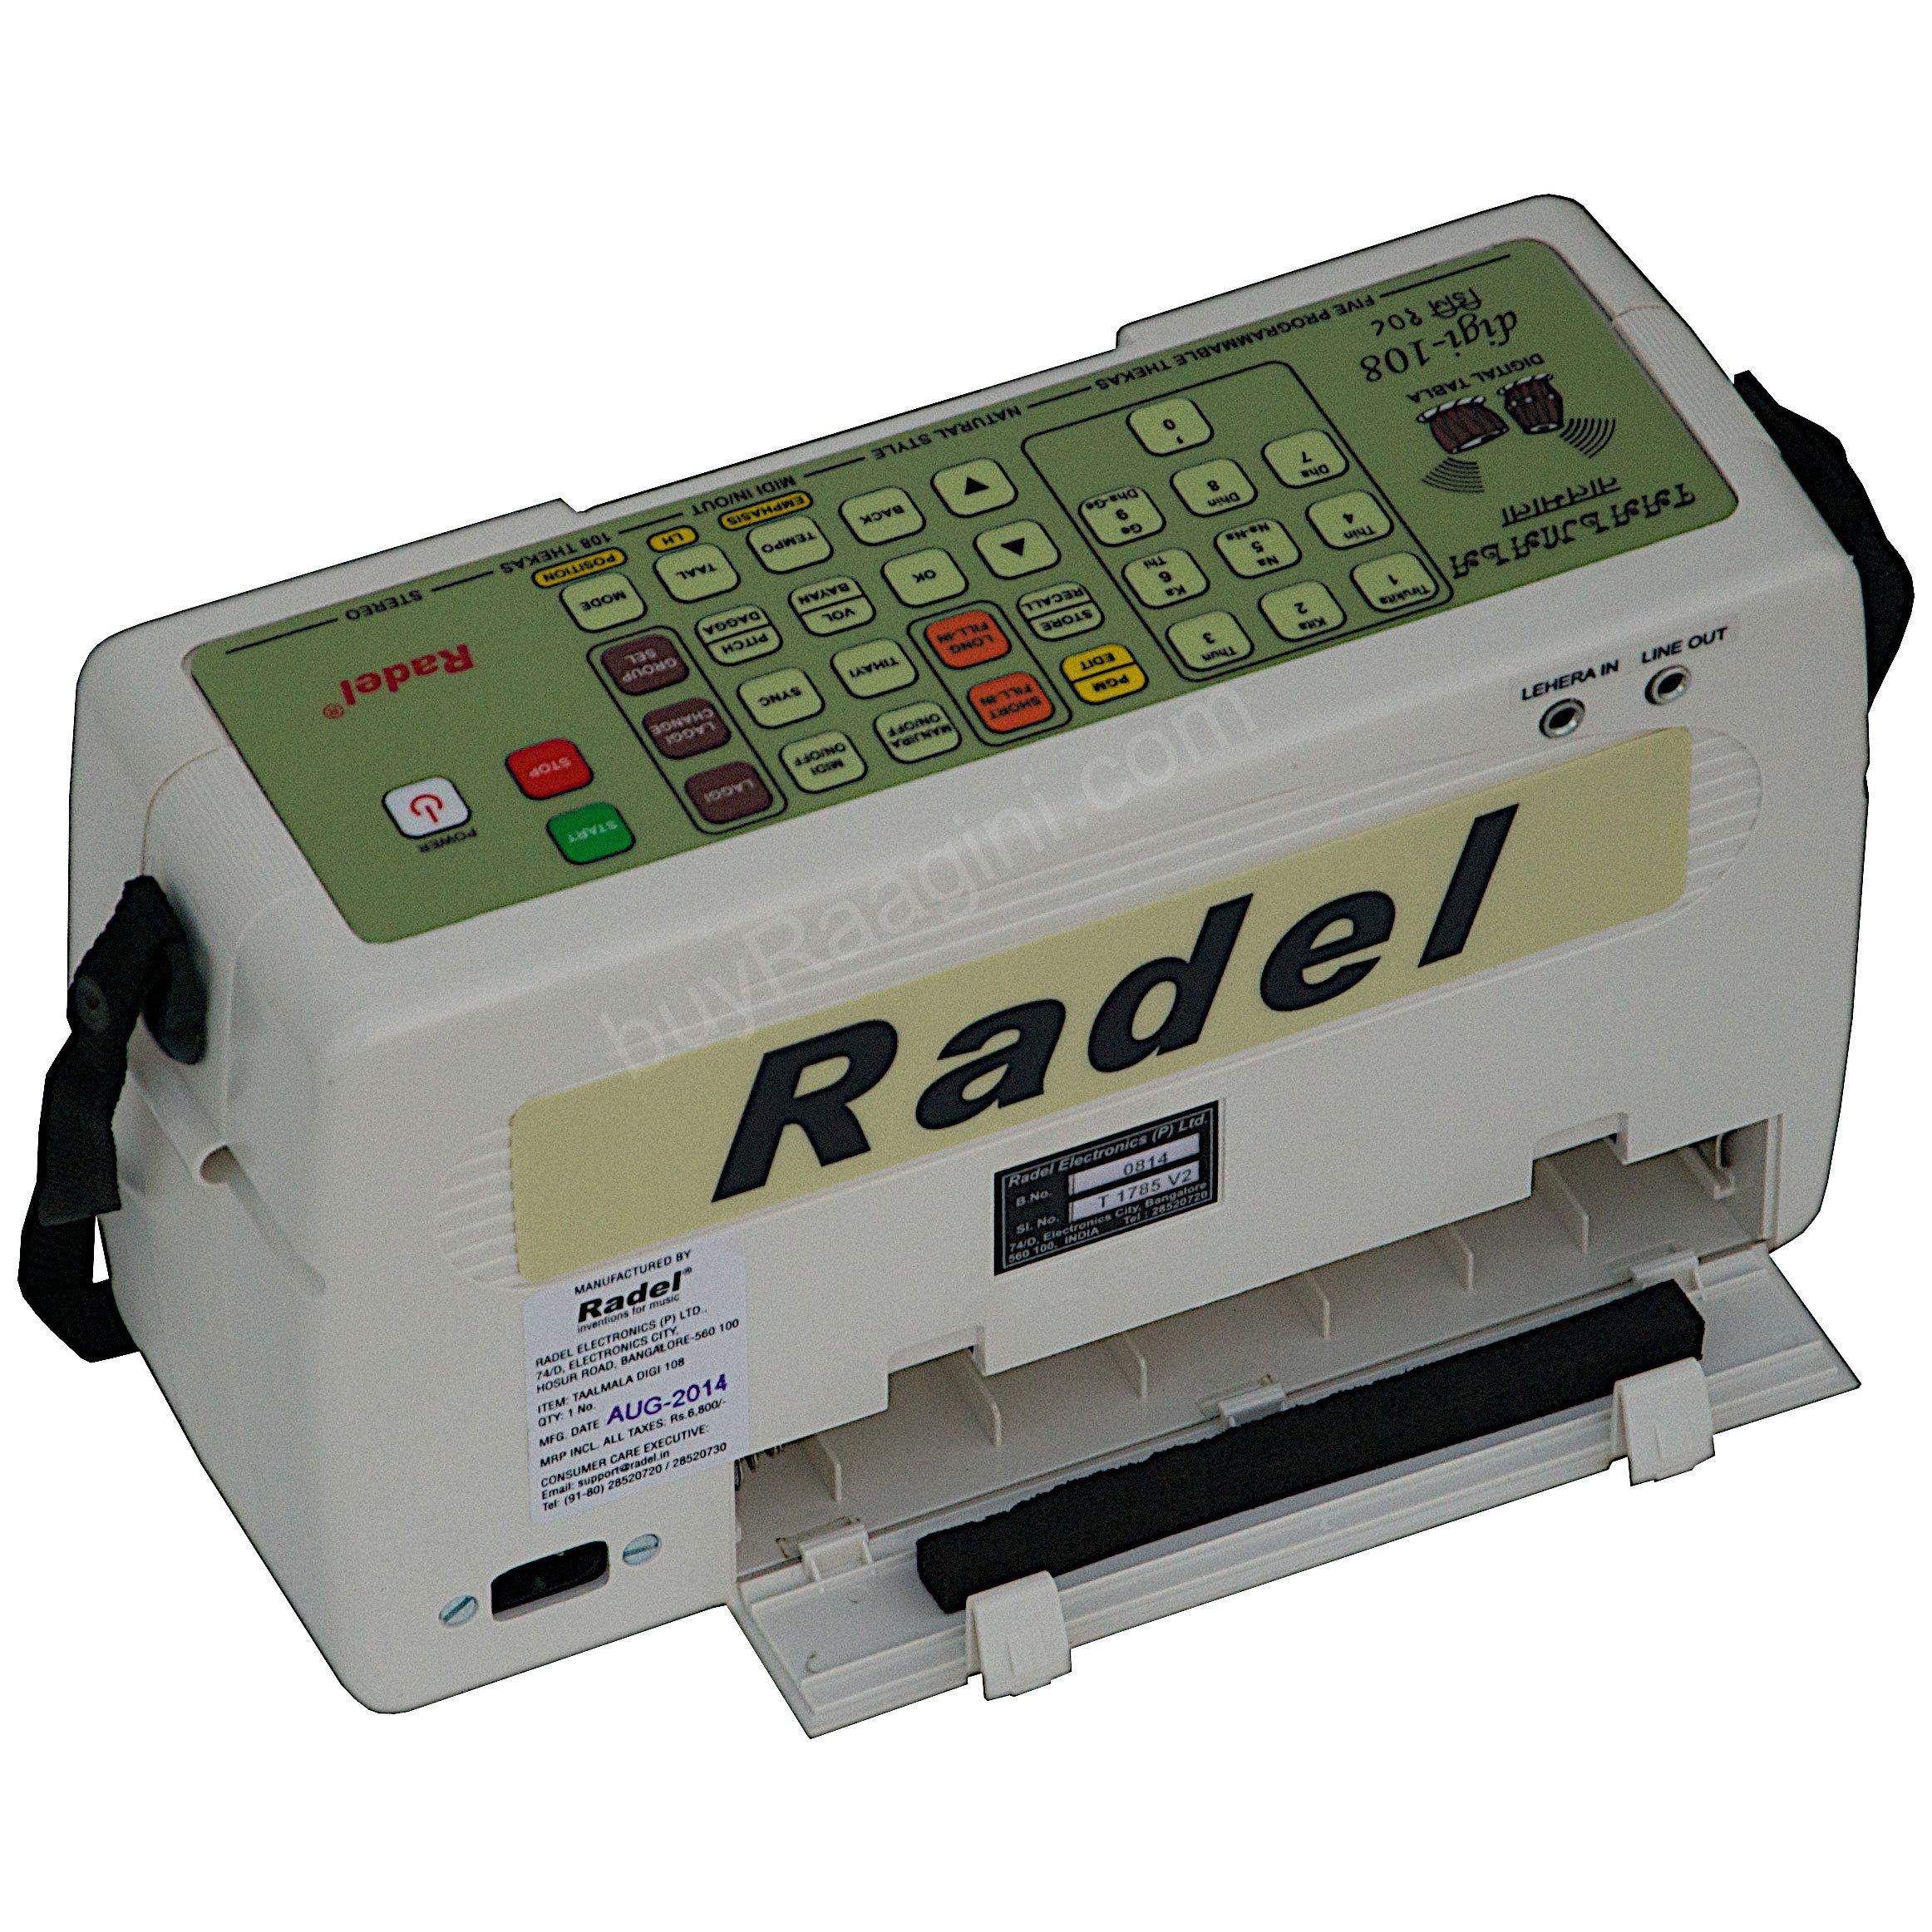 Electronic Tabla - RADEL Taalmala - Digi 108, Electronic Tabla & Manjira - Tabla Sampler, DJ Tabla Sound Machine, Instruction Manual, Power Cord, Bag (US-PDI-AAF) by Radel at buyRaagini.com (Image #7)